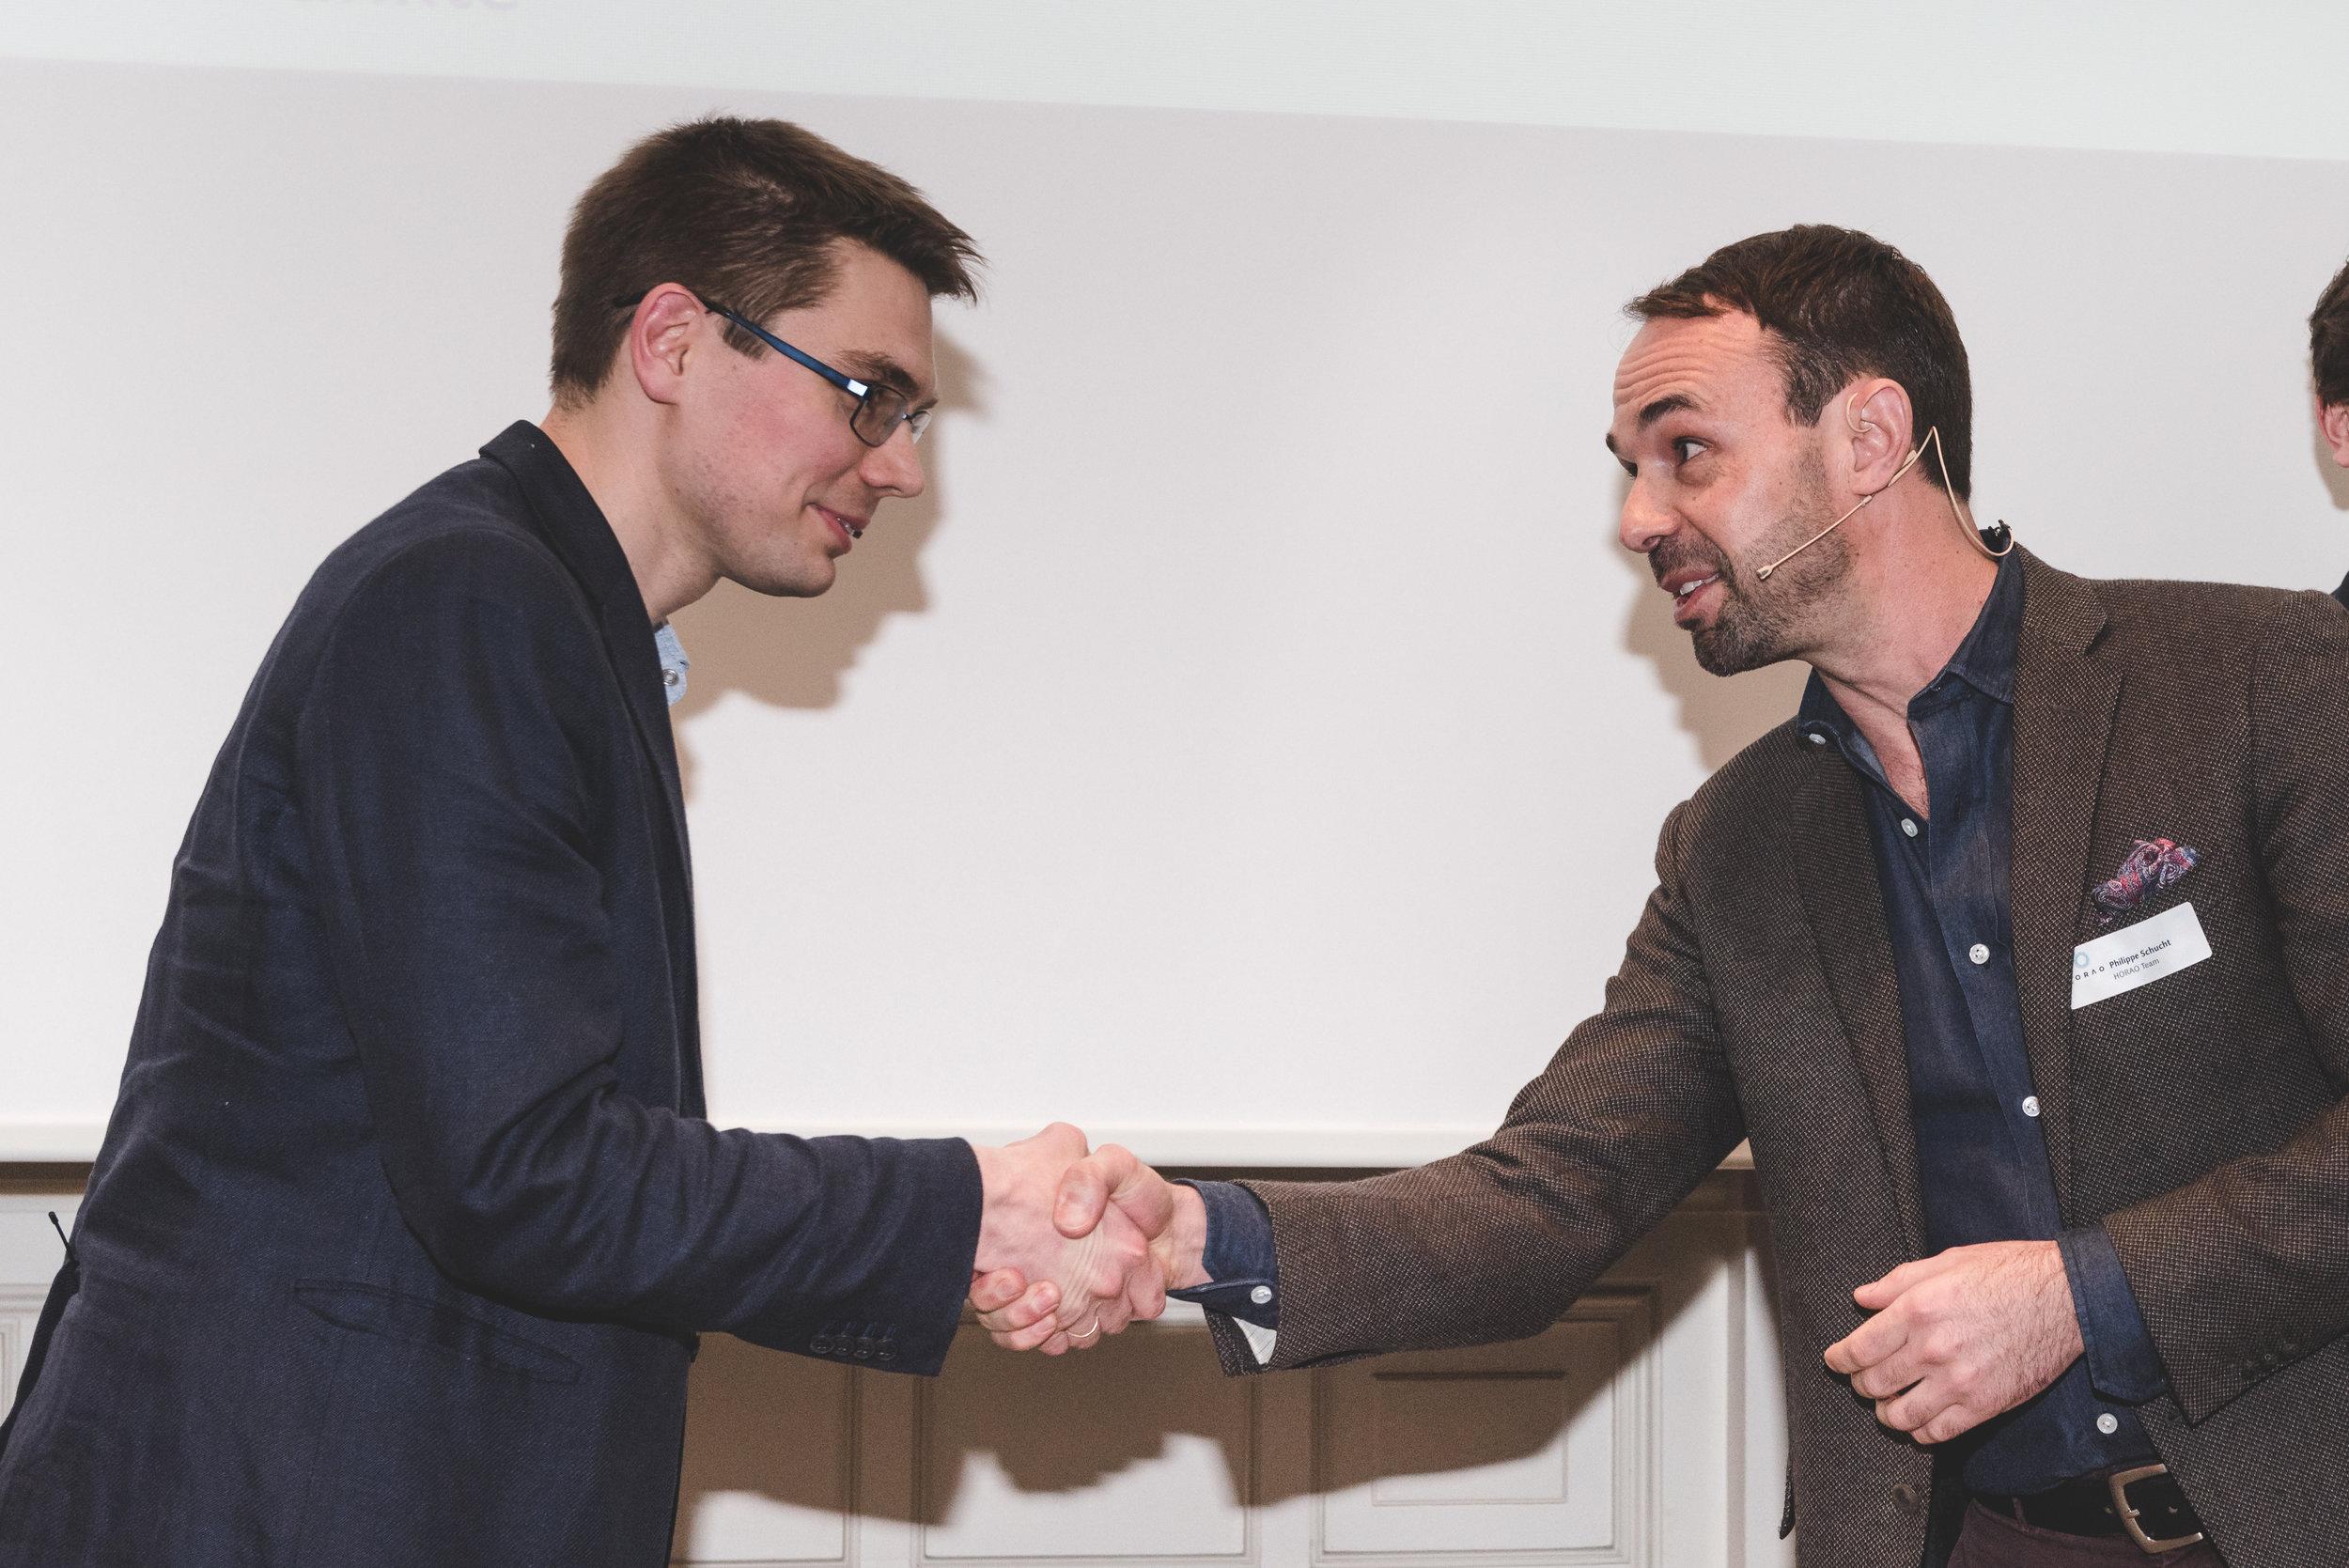 Philippe Schucht (r.), Head HORAO Project, congratulates HORAO Winner Ivan Gusachenko (l.).